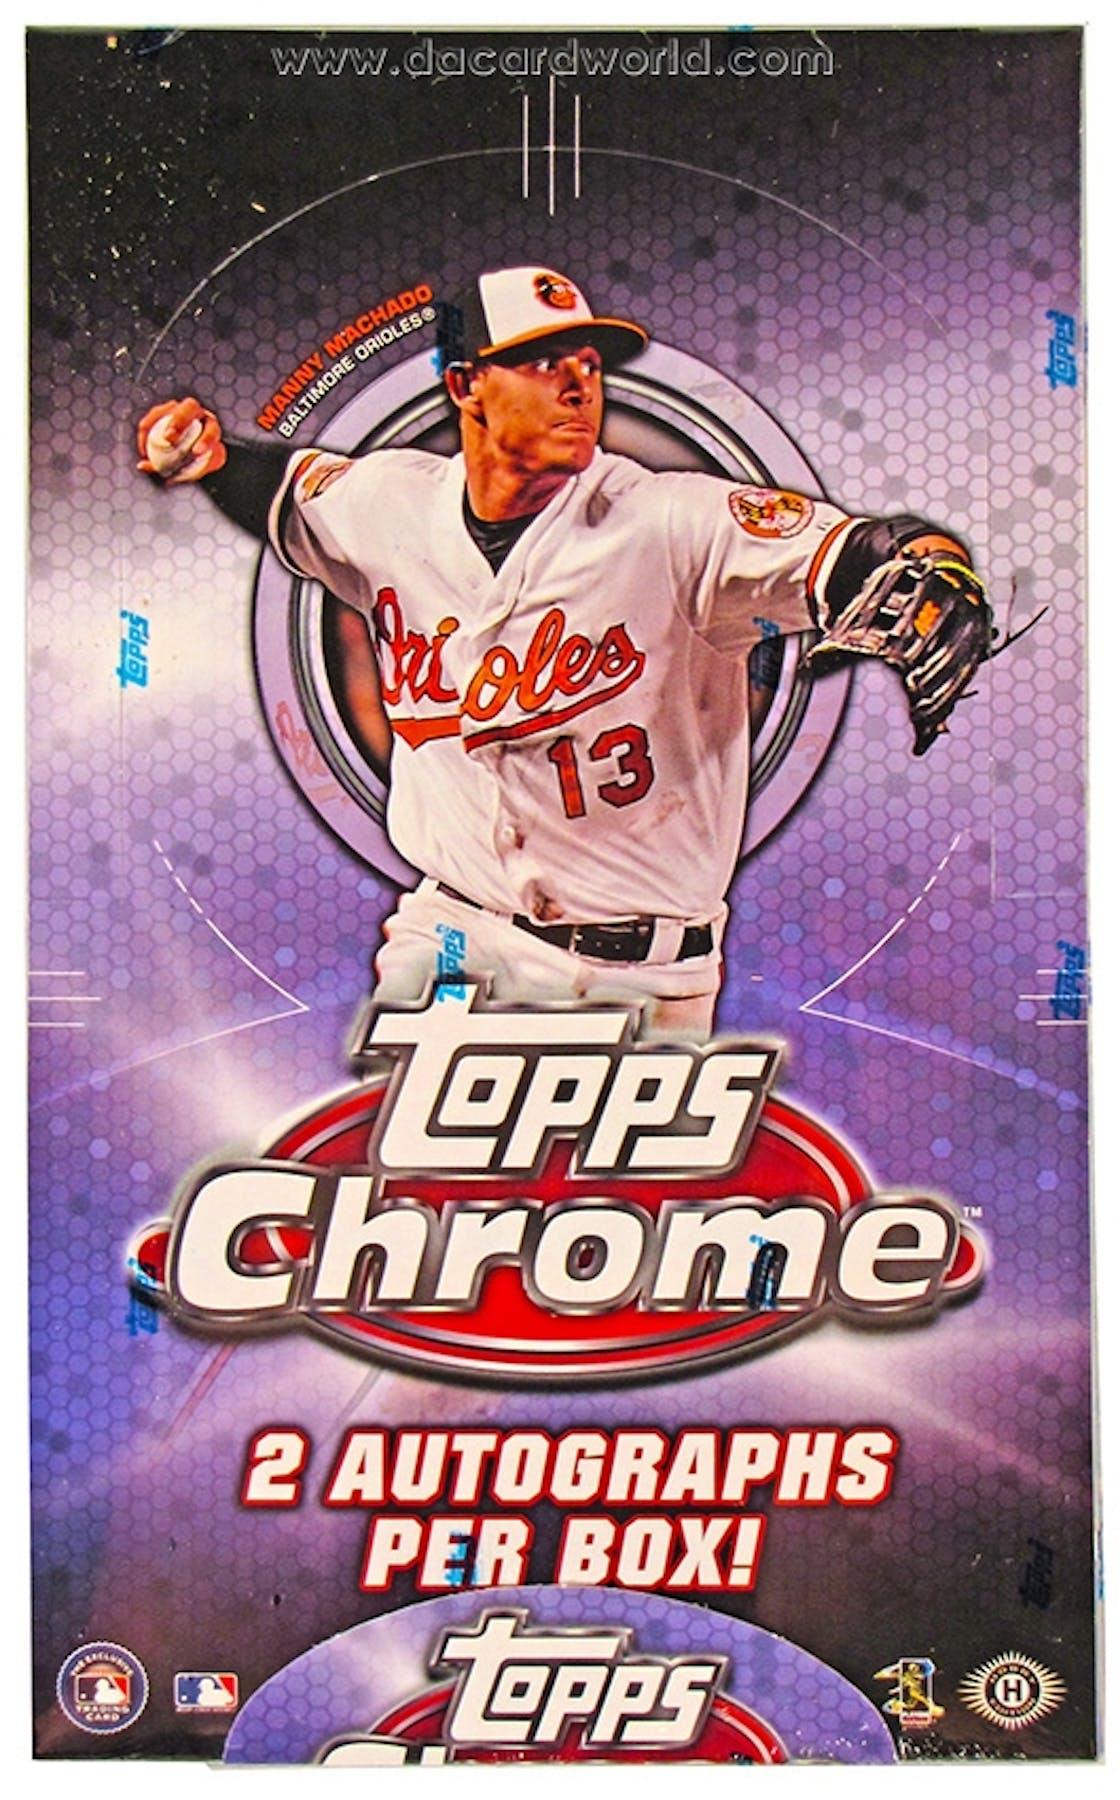 2013 Topps Chrome Baseball Hobby Box Da Card World